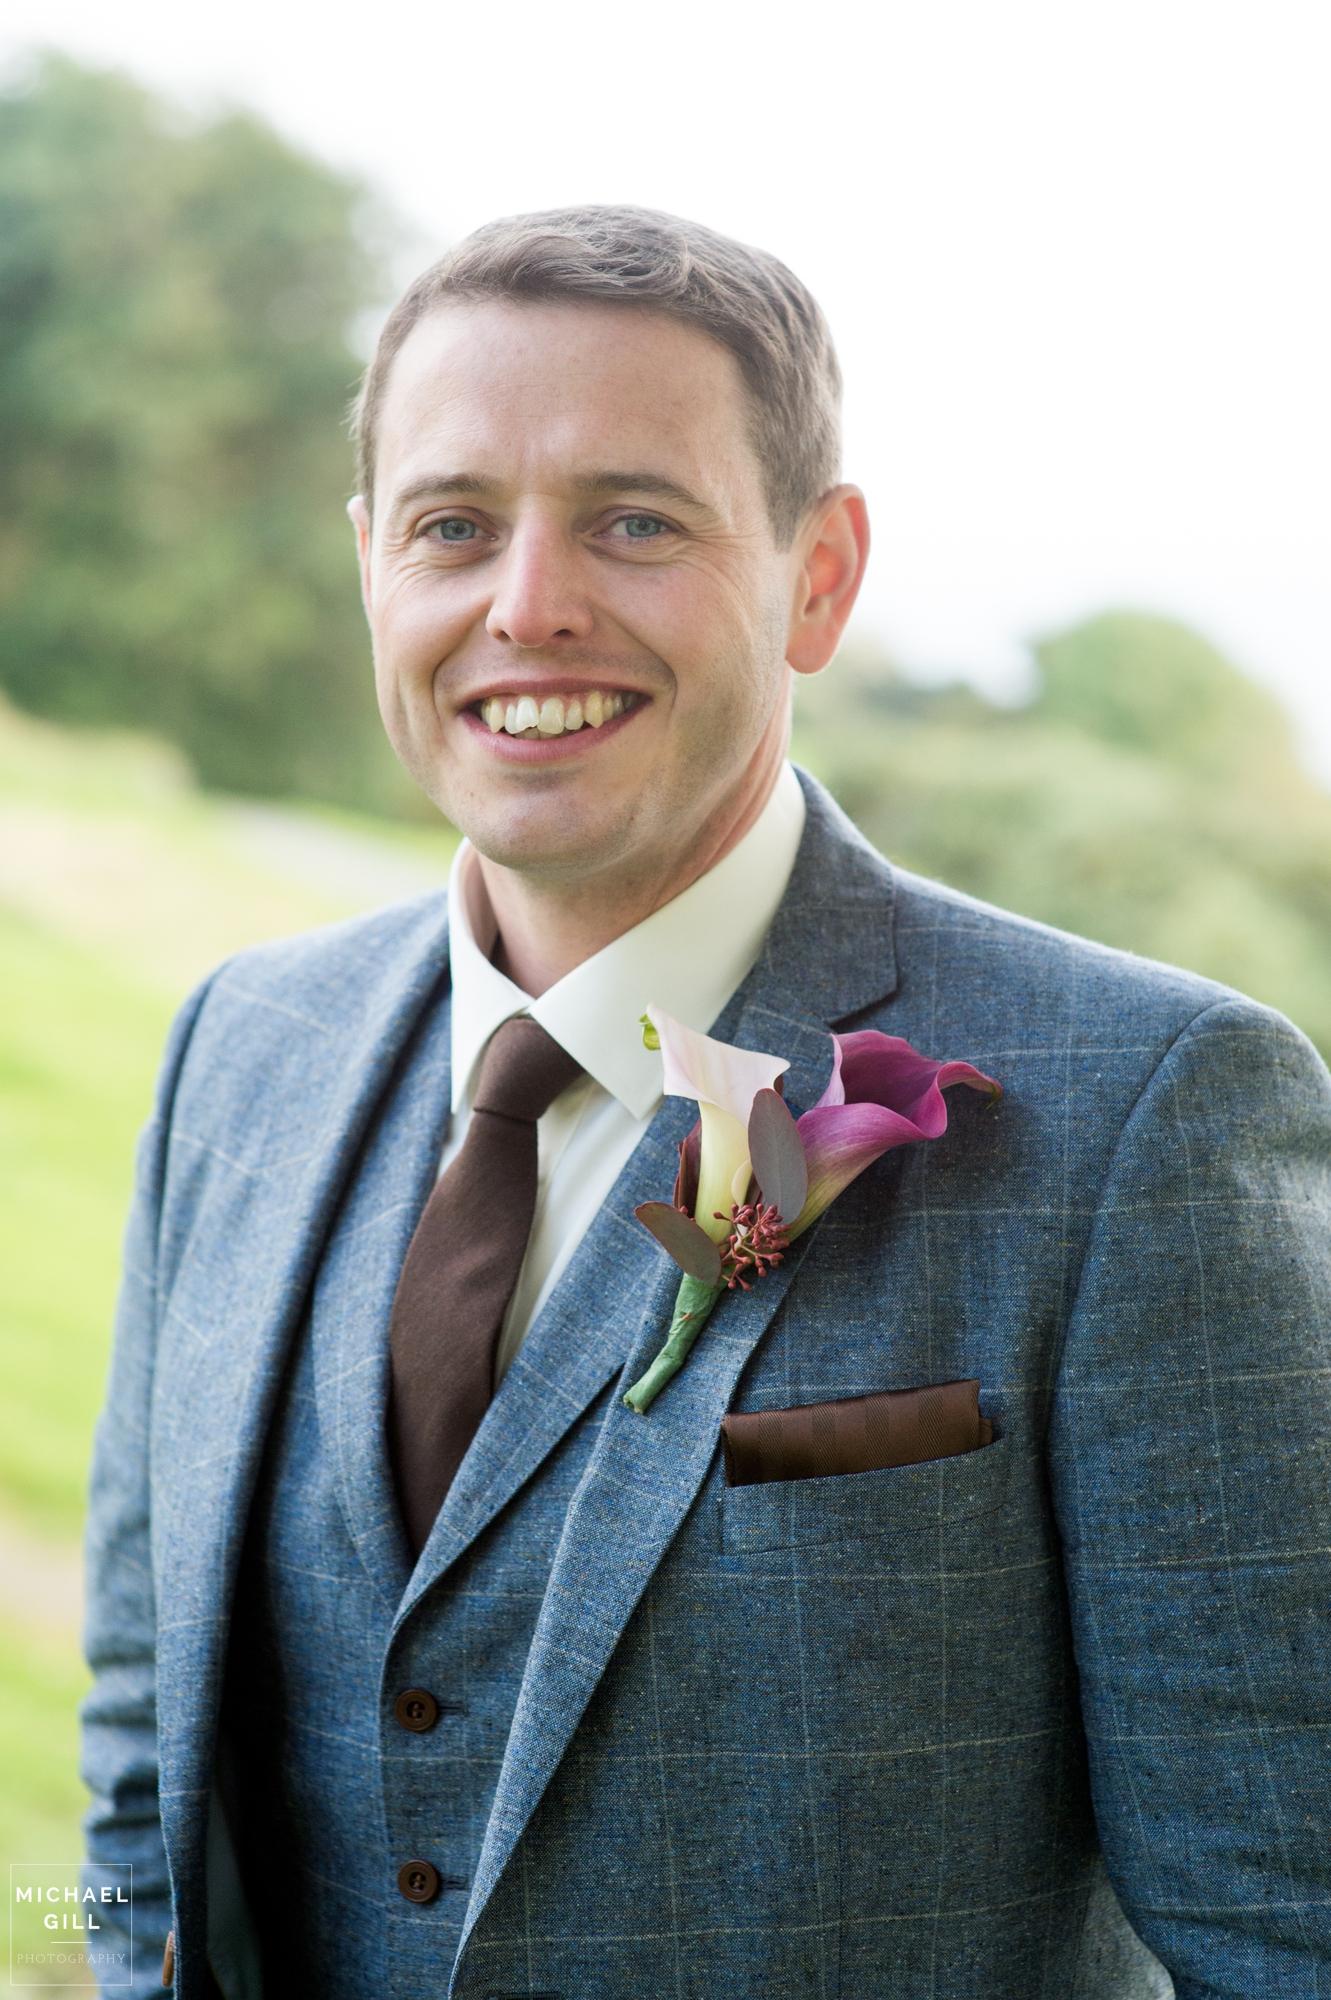 Michael_Gill_Photography_Kinnego_Redcastle_Hotel_Wedding2.jpg